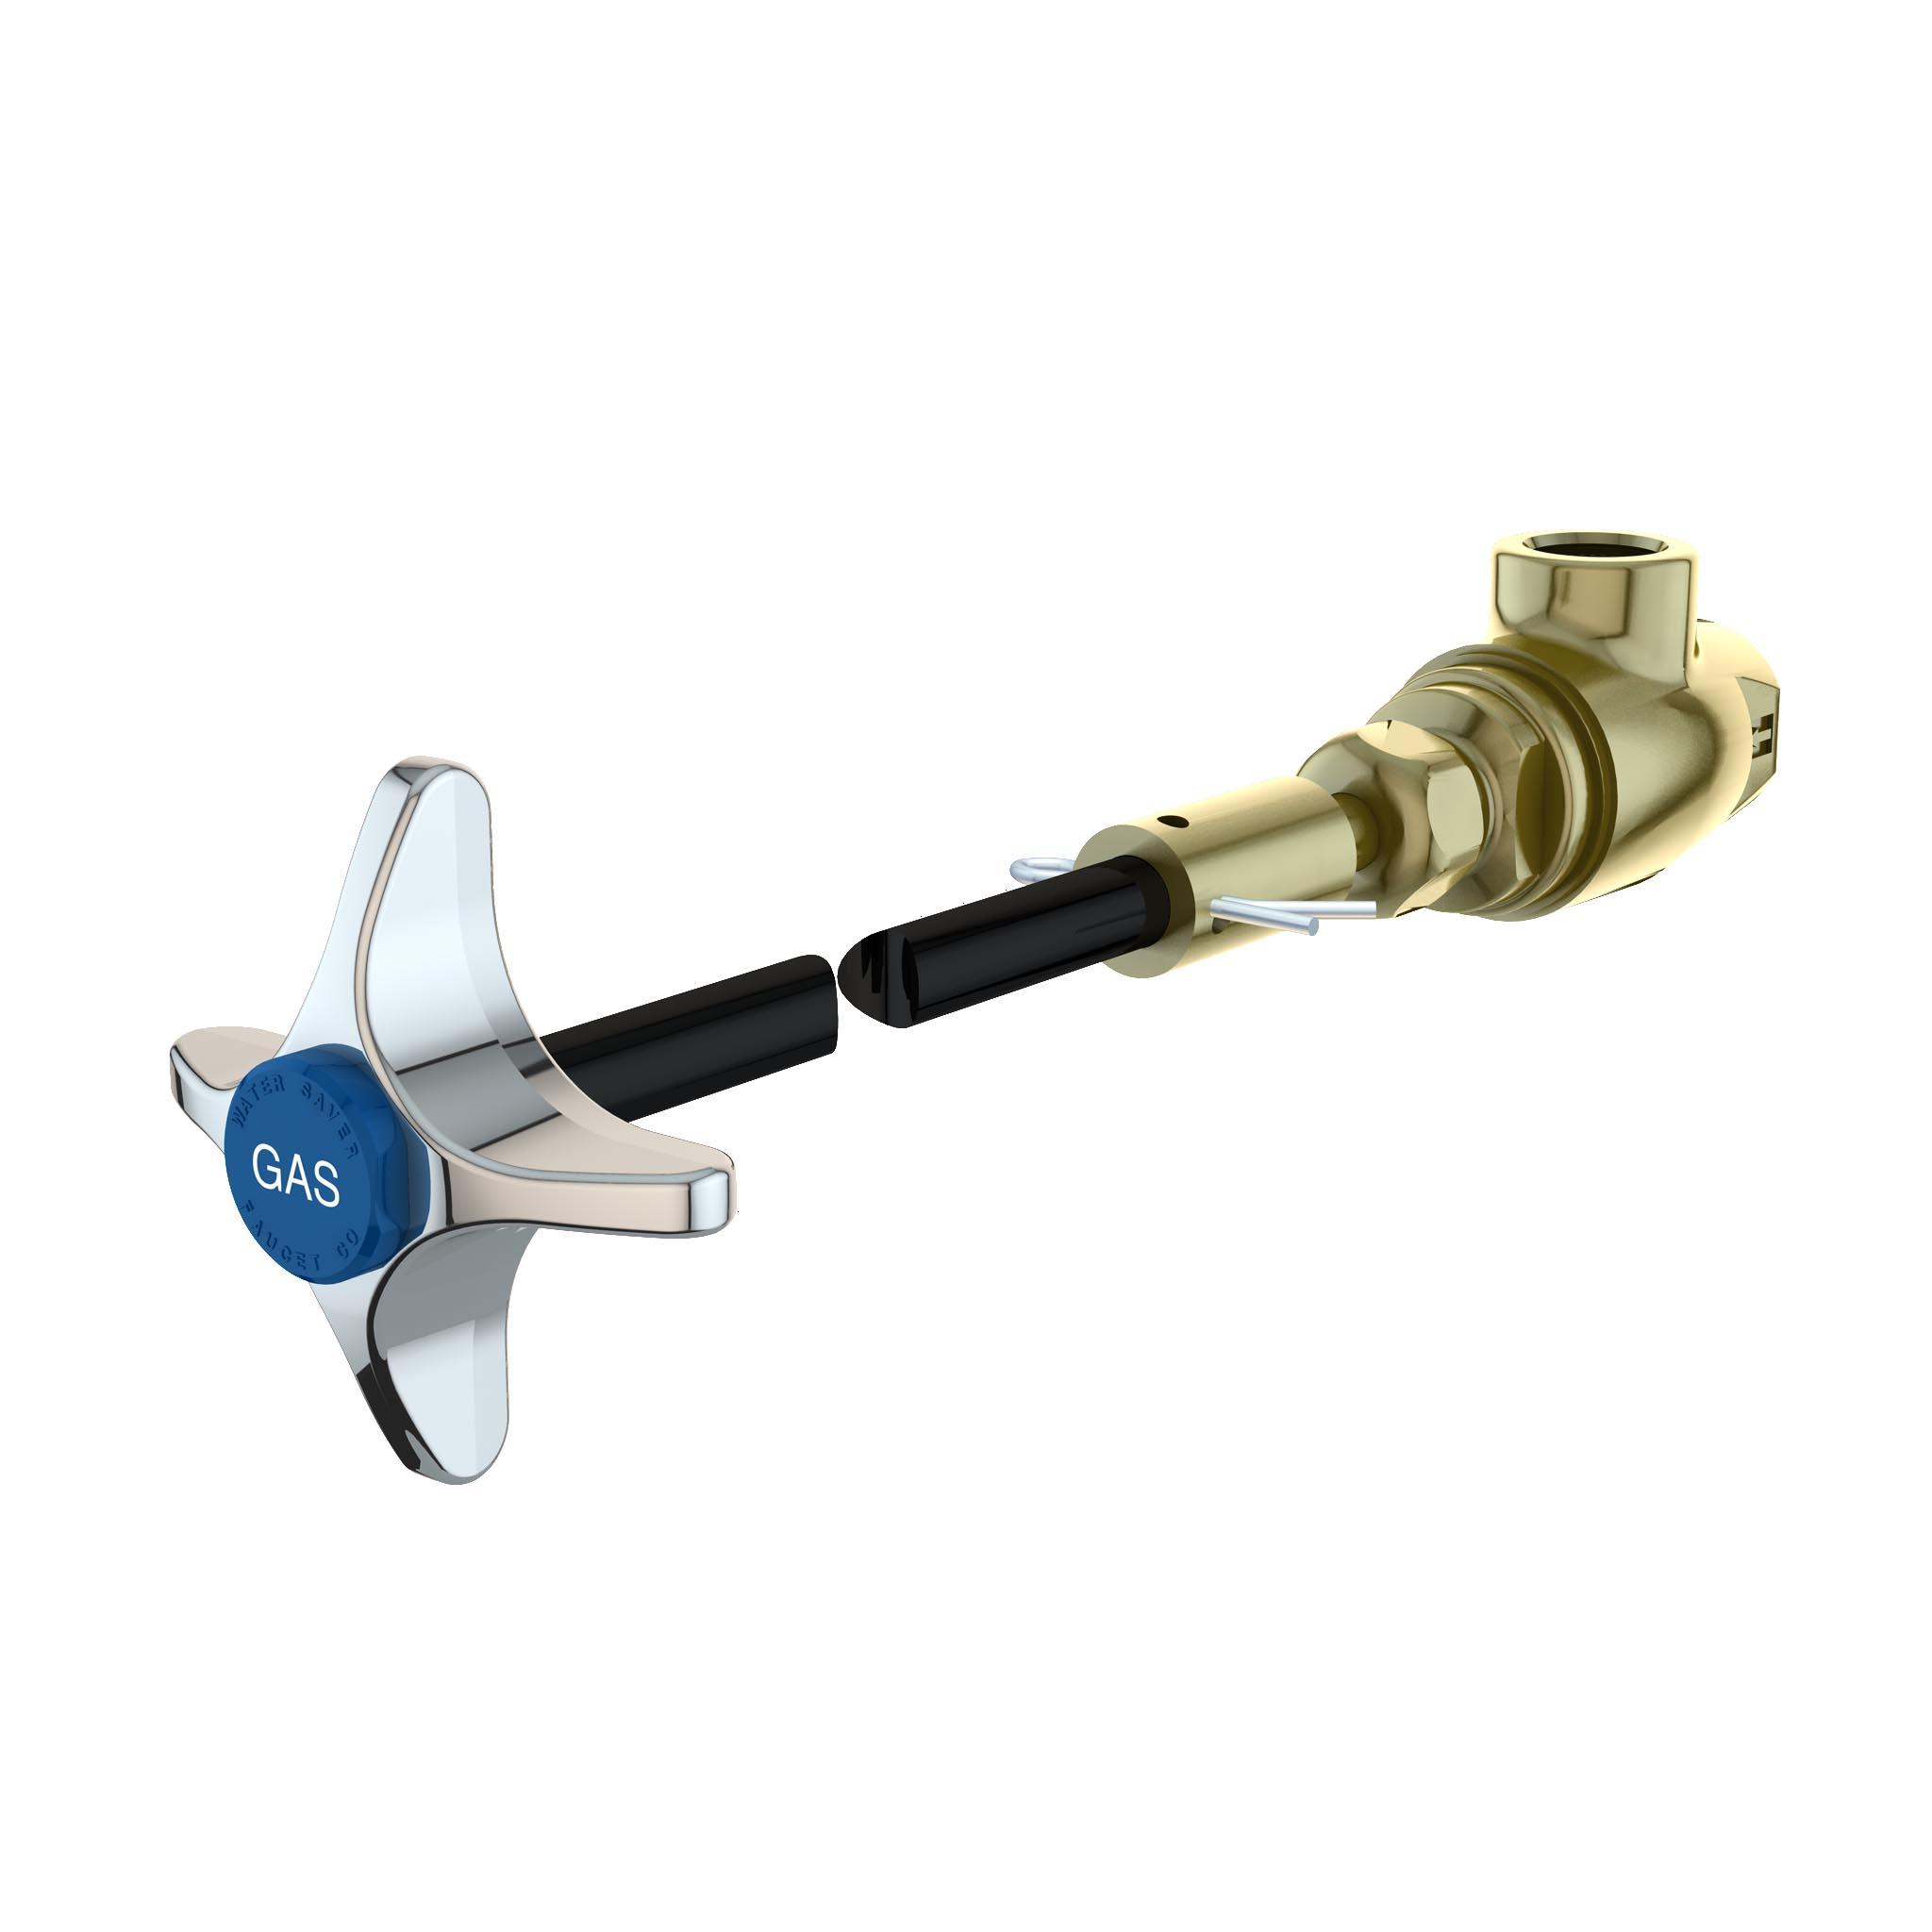 L3185 Watersaver Faucet Co